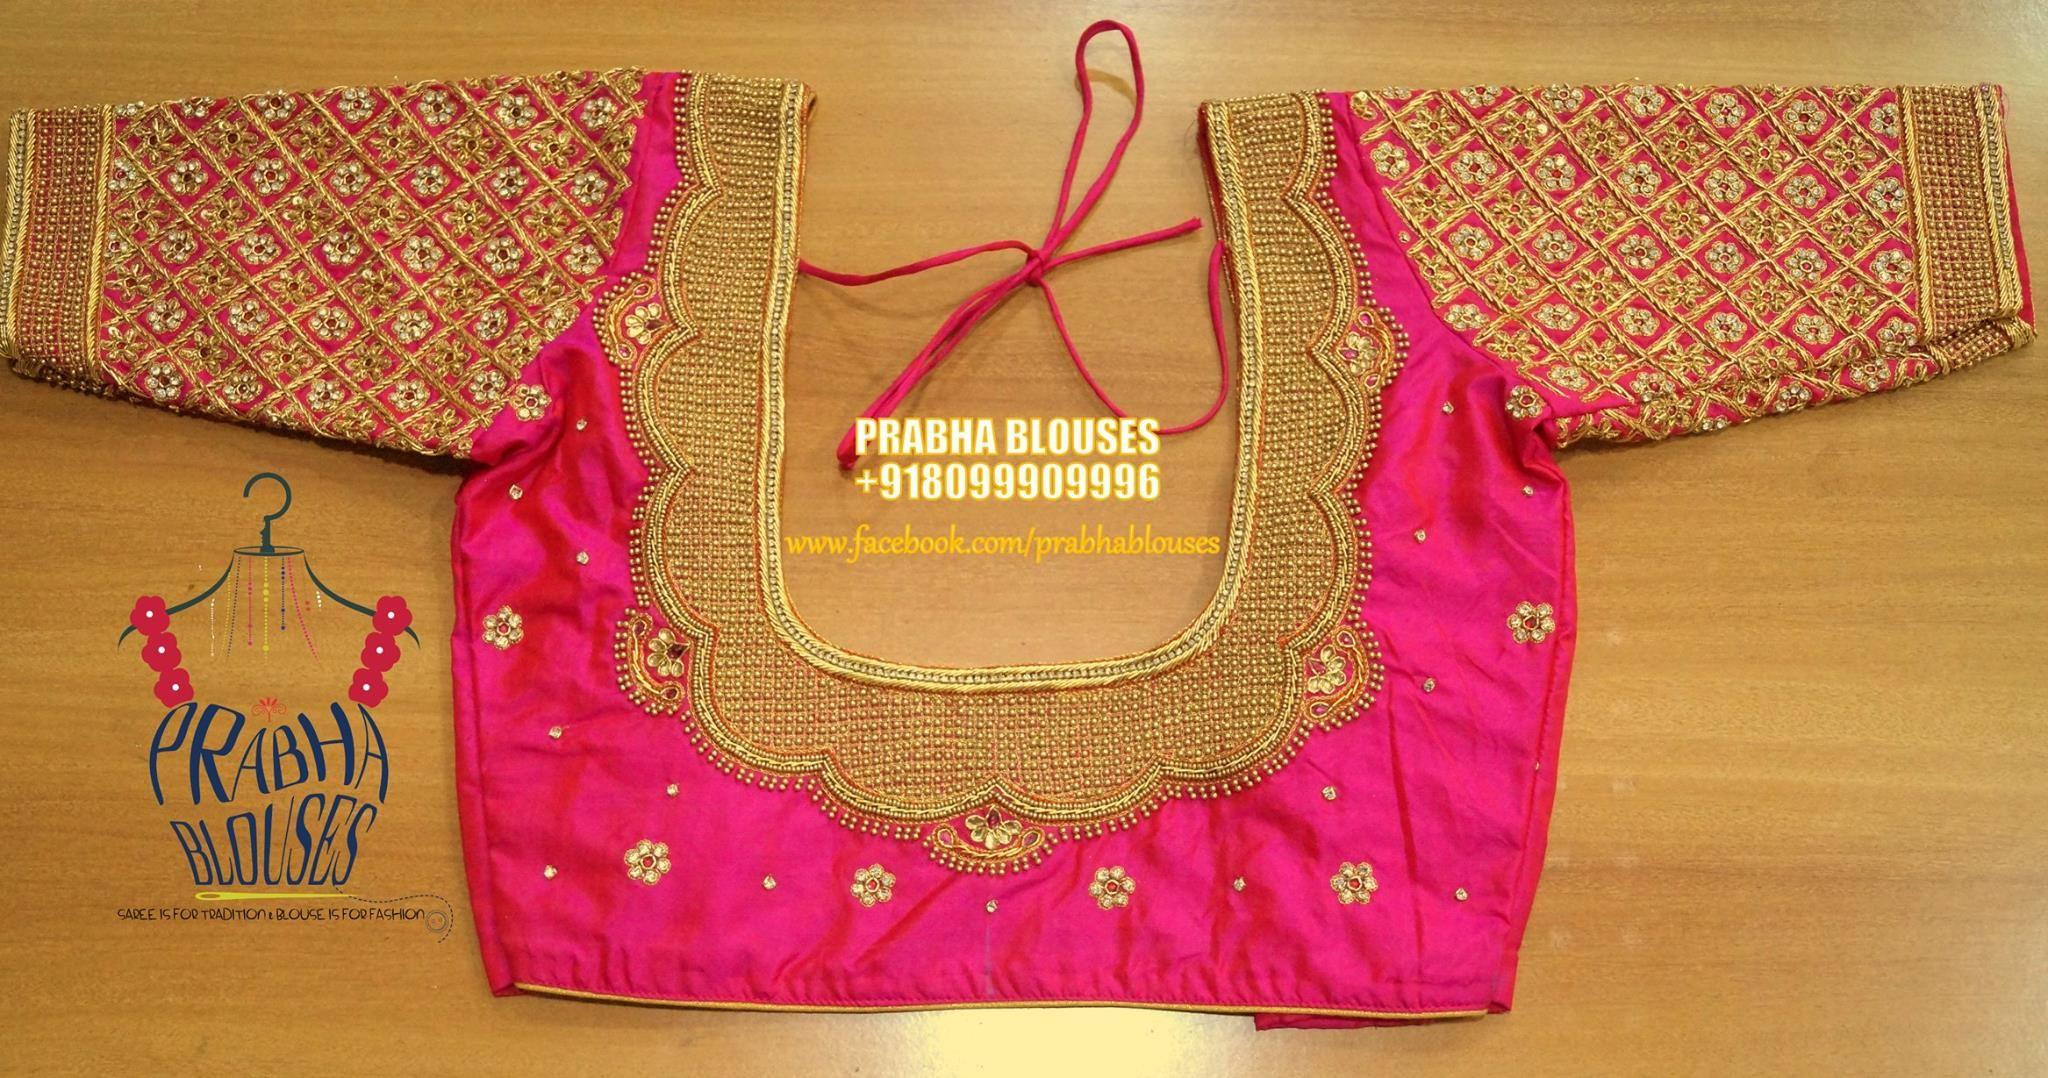 7e180540c2 Prabha blouses. Hyderabad.<br> 12-6-211/3 viveknagar kukatpally. <br>  Contact : 080999 09996. <br> Email : prabha.blouses@gmail.com.